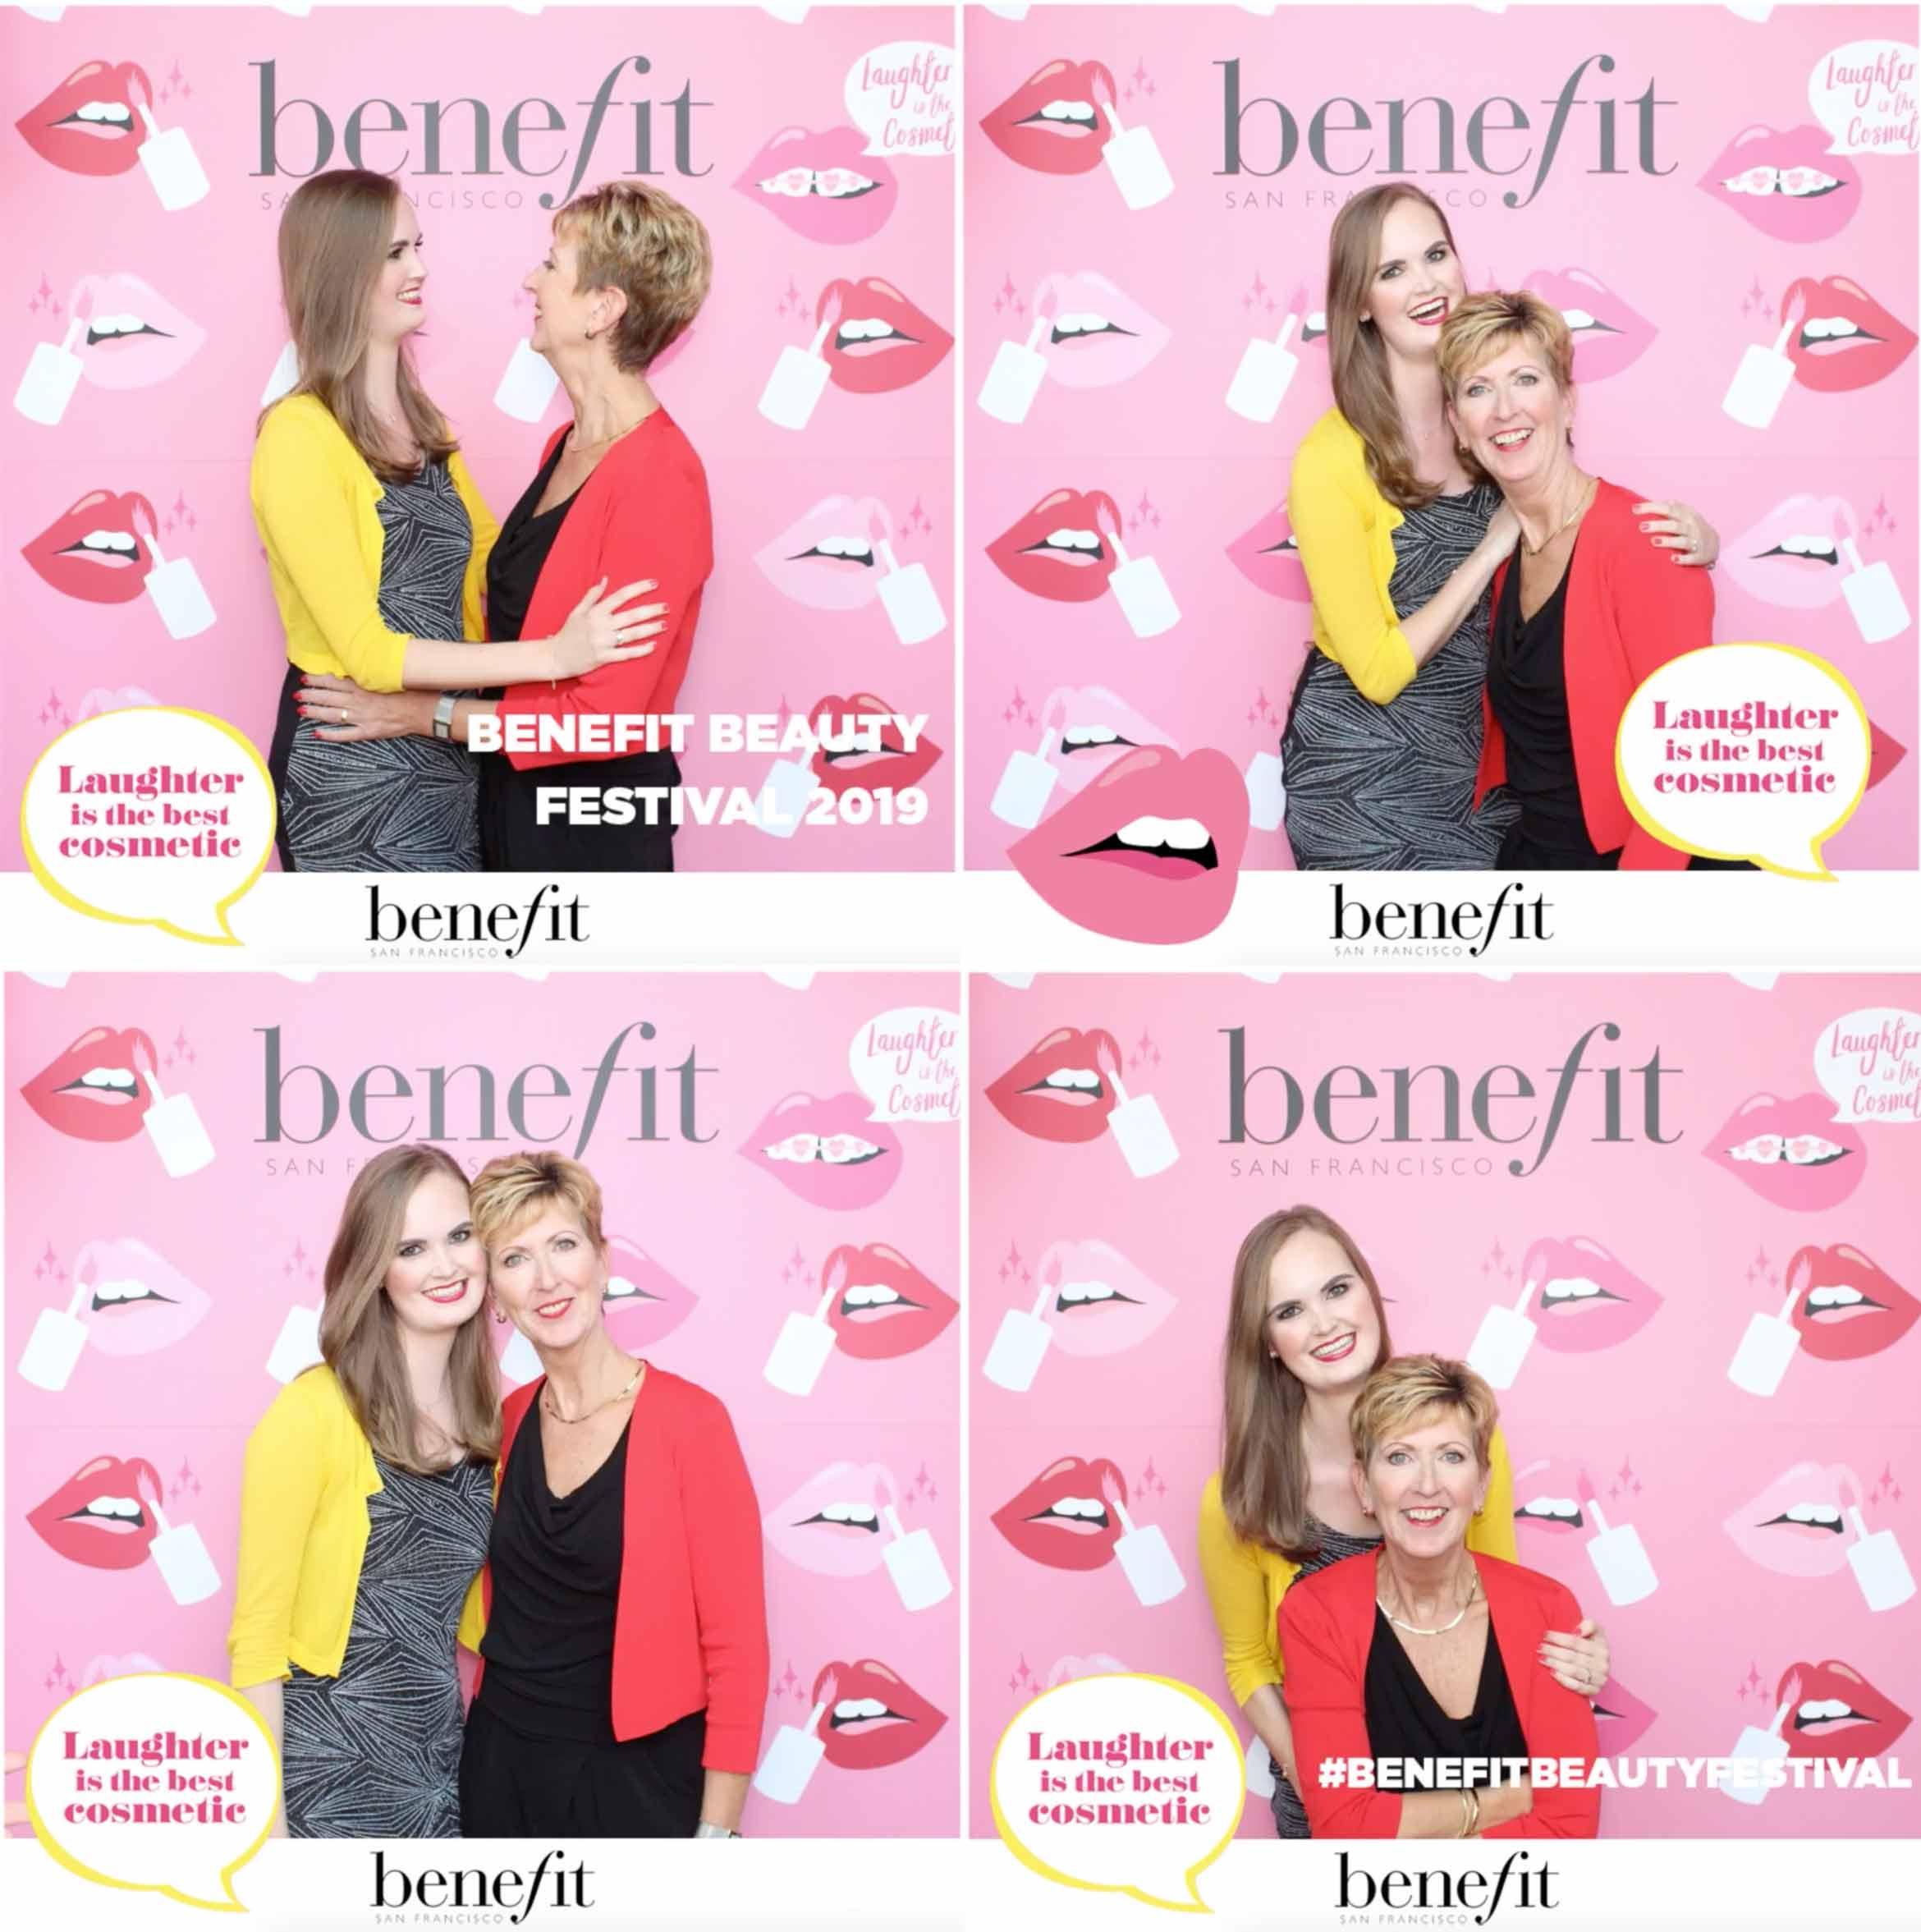 benefit-beauty-festival-2019-12